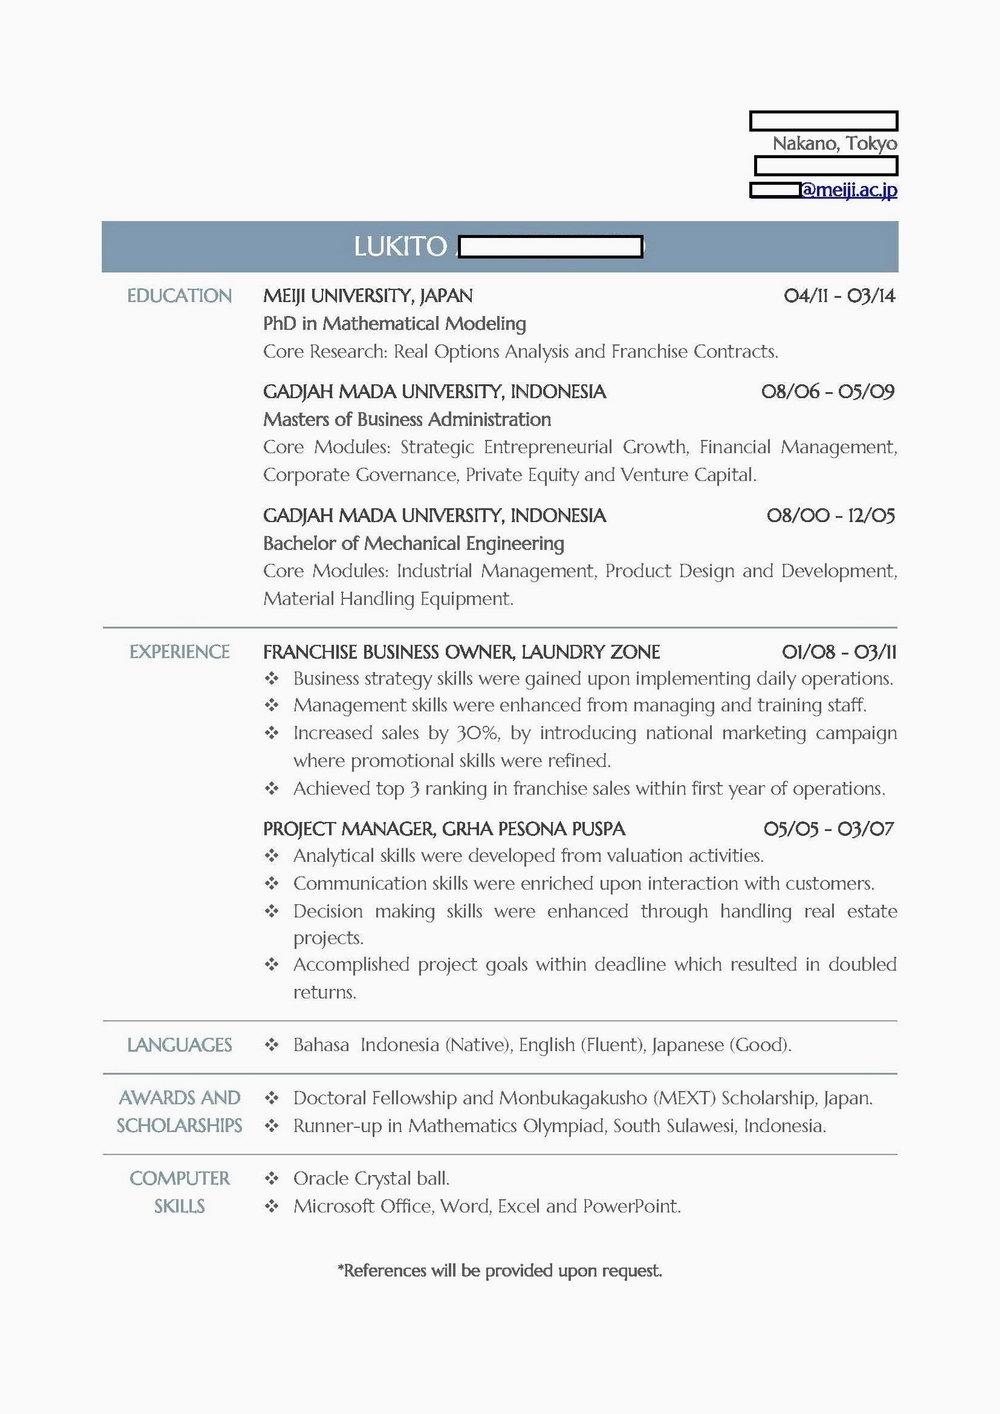 Hire Top Resume Writers in Atlanta, GA ❘ LinkedIn